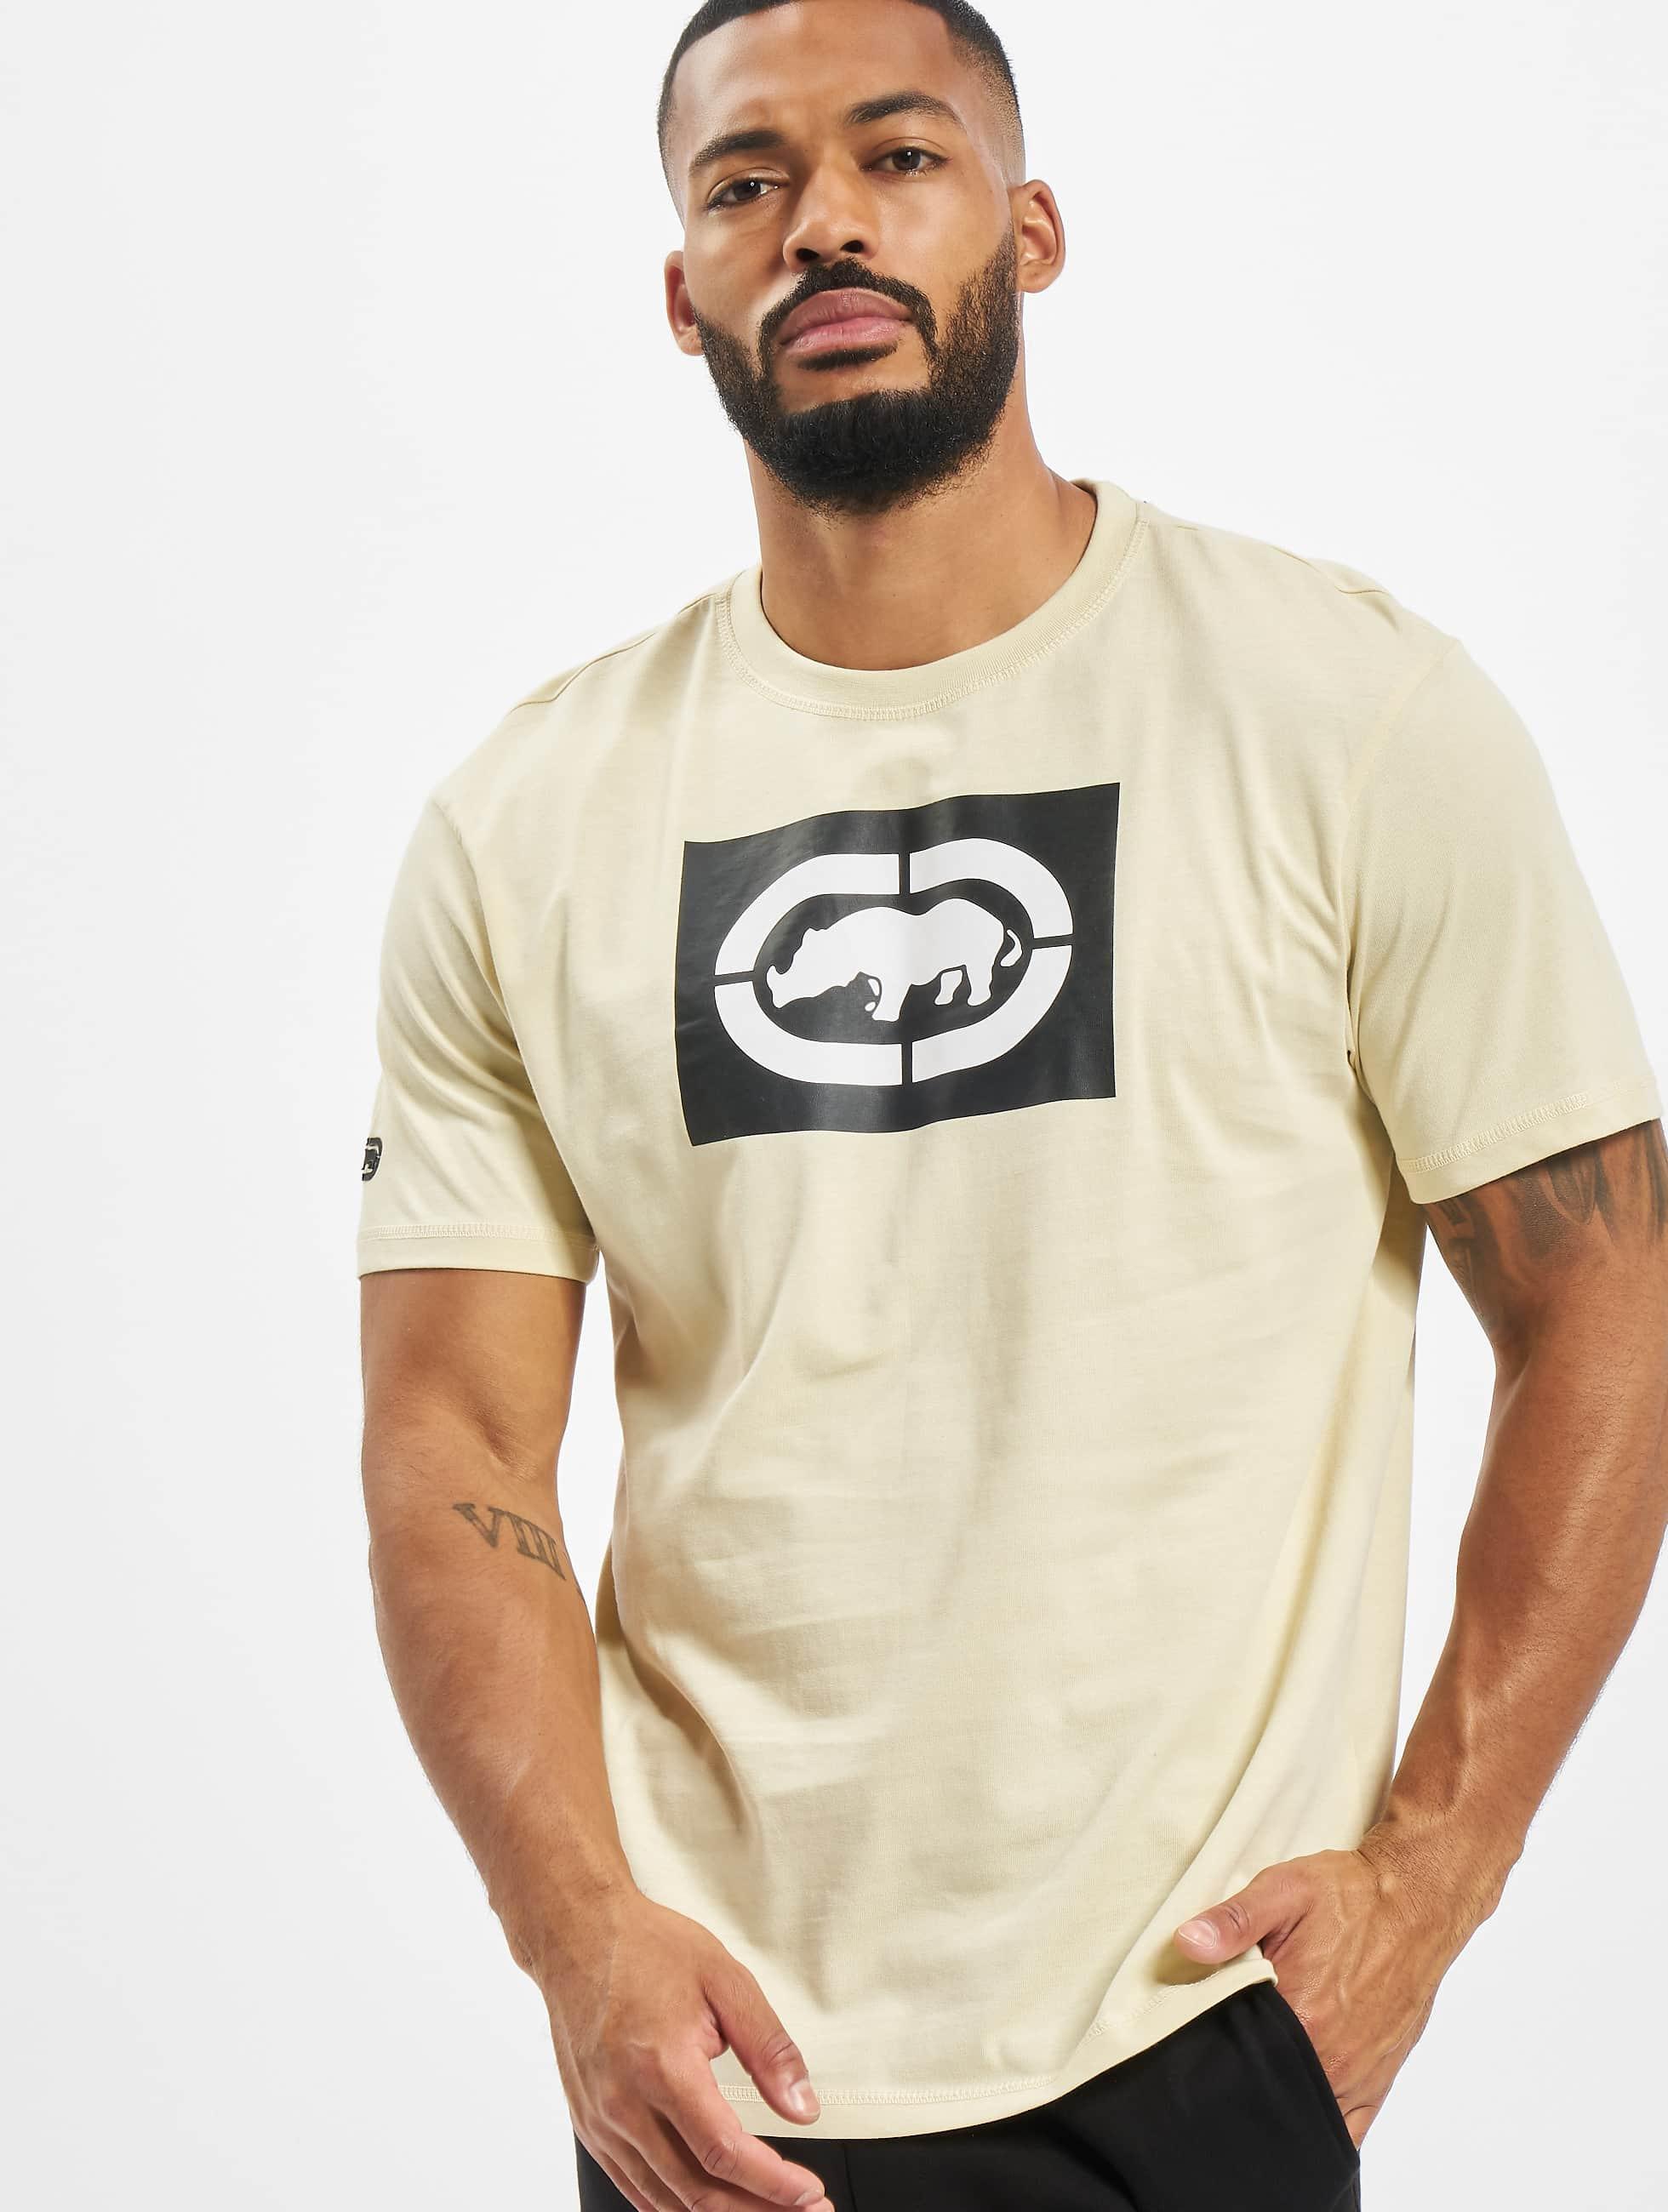 Ecko Unltd. / T-Shirt Base in white S